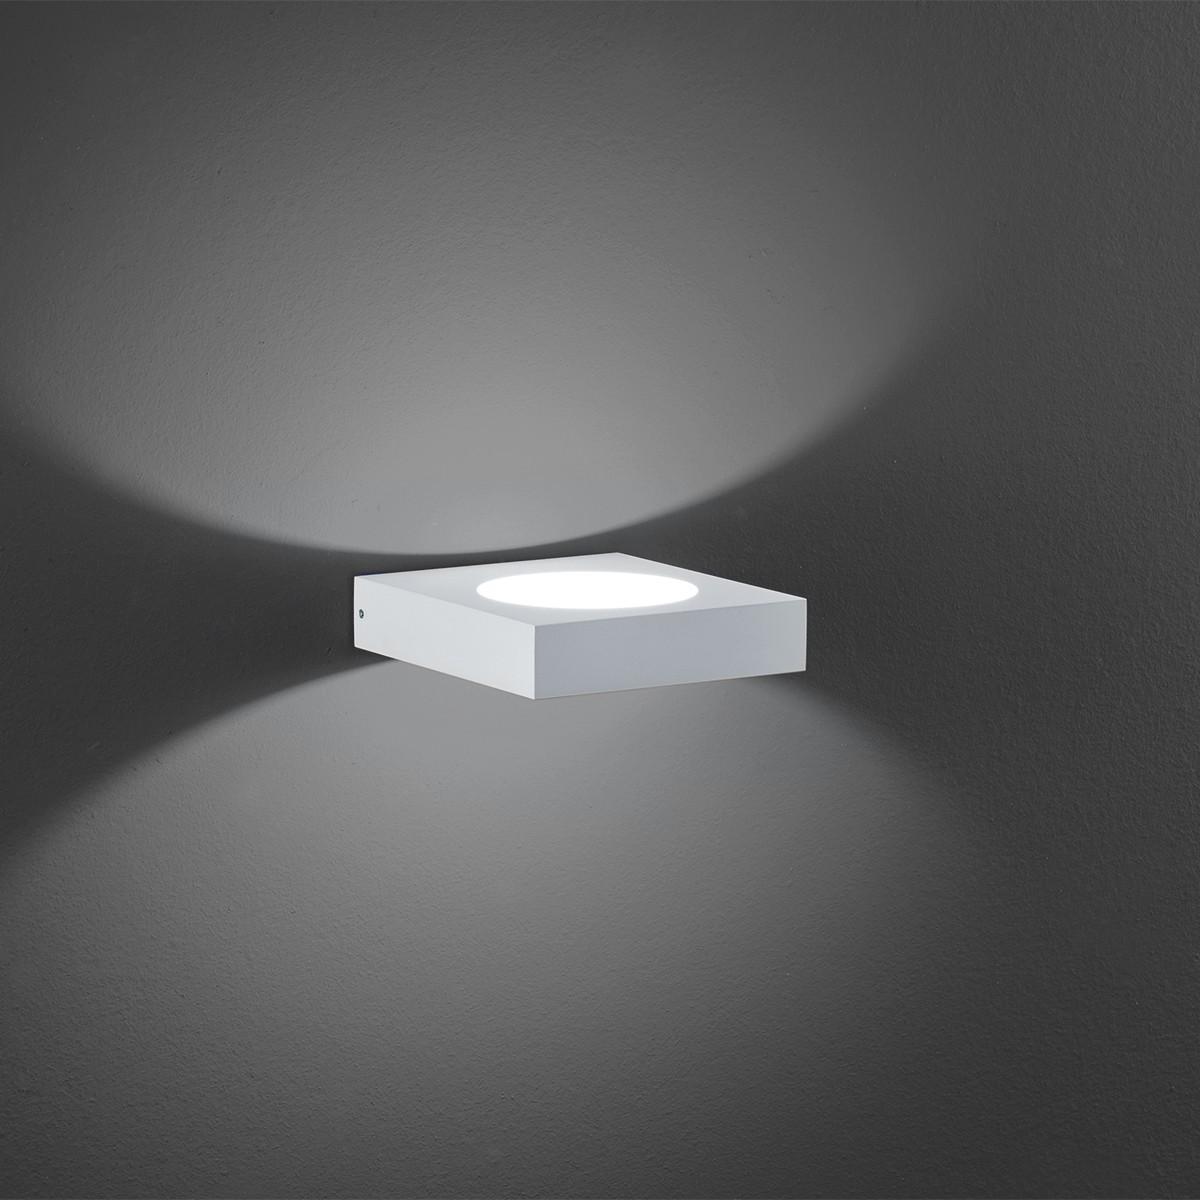 B-Leuchten Cube Wandleuchte In & Out, weiß